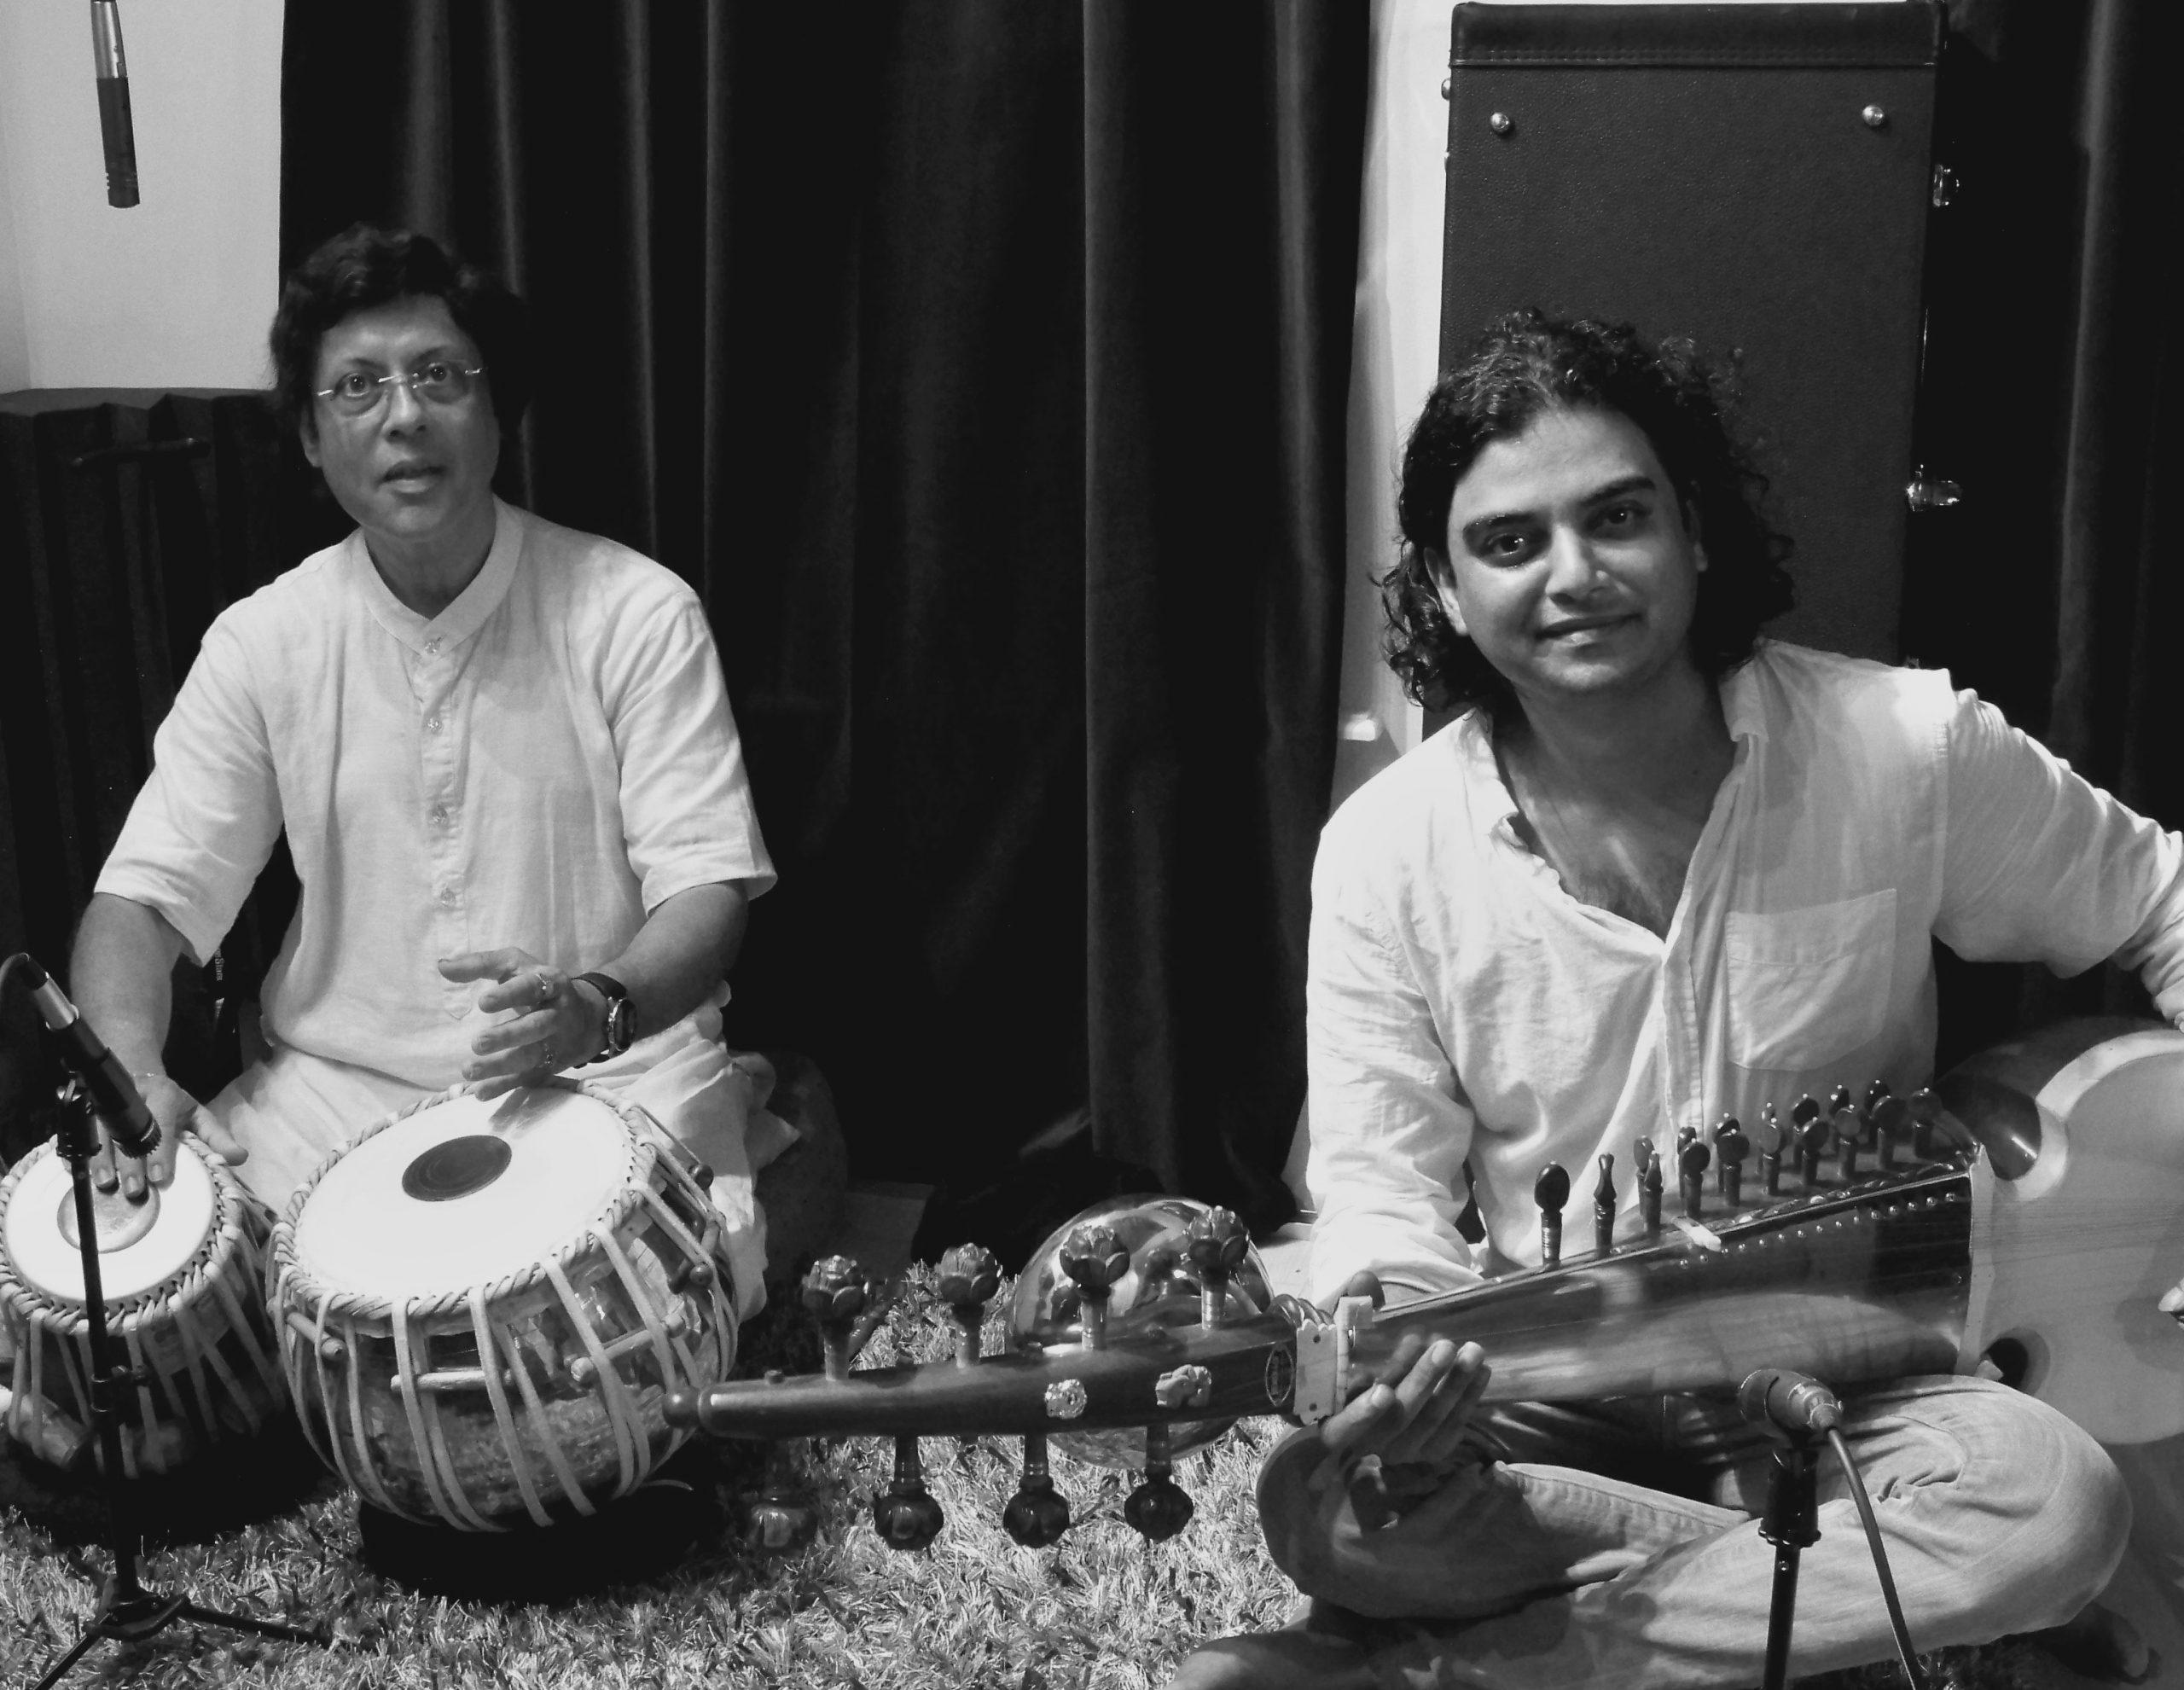 Anupam Shobhakar and Pandit Anindo Chatterjee